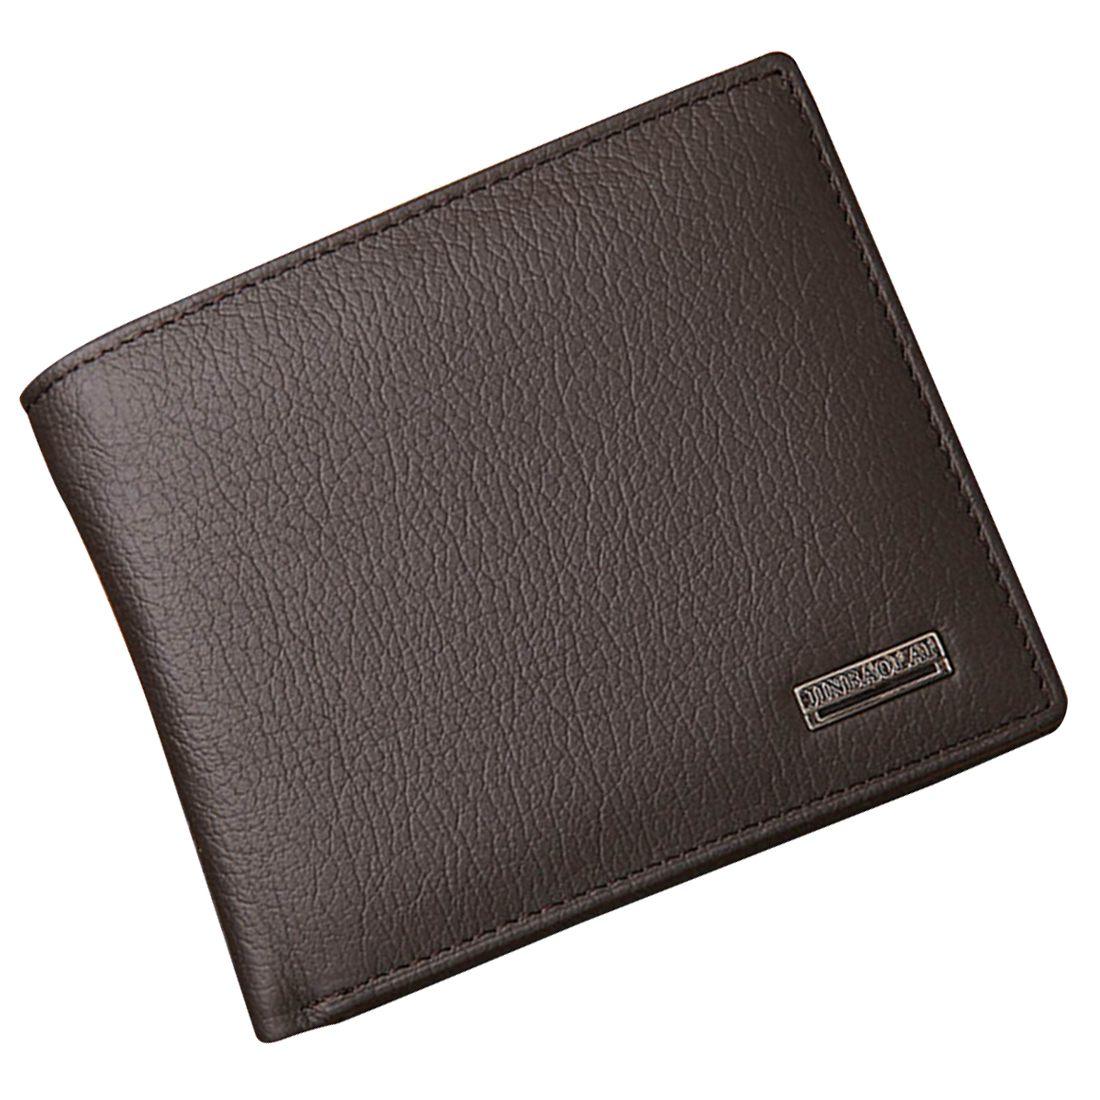 Hot Fashion JINBAOLAI Small Short Leather Mens Wallet Male Wallet Bag Wallet Vallet Card Money Persian world Wallet(Black)